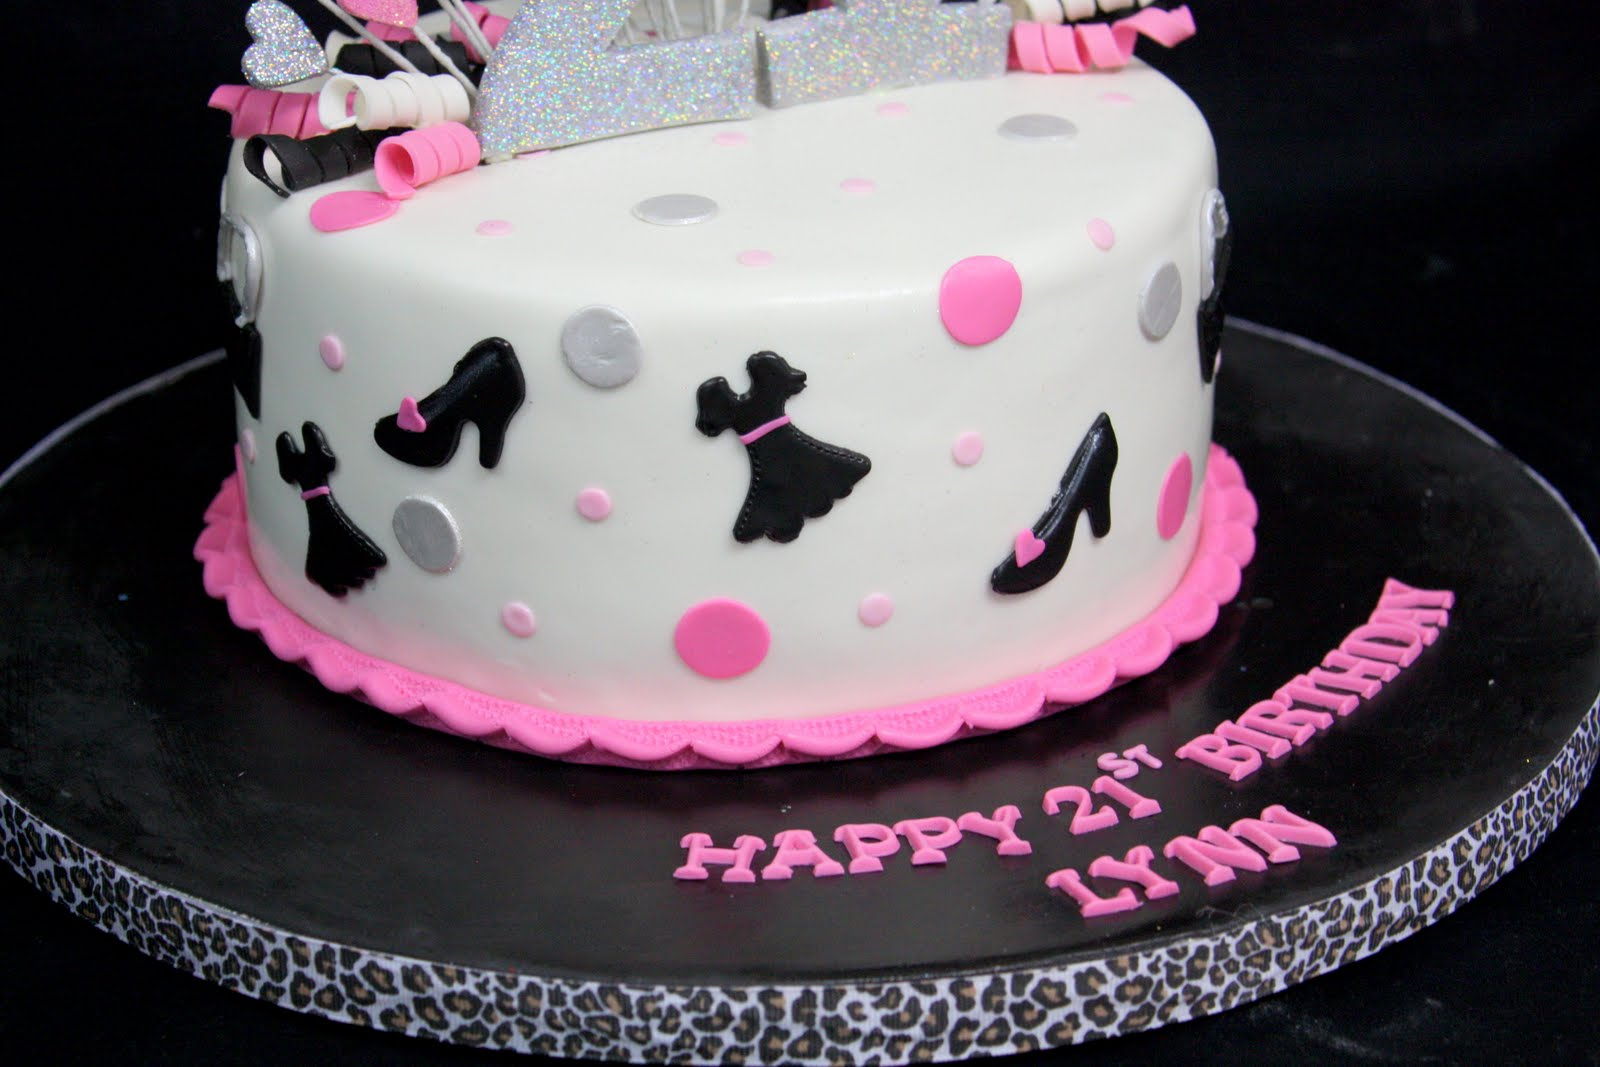 Birthday Cake Images Glitter : Complete Deelite: Fashion Glitter 21st Birthday Cake!